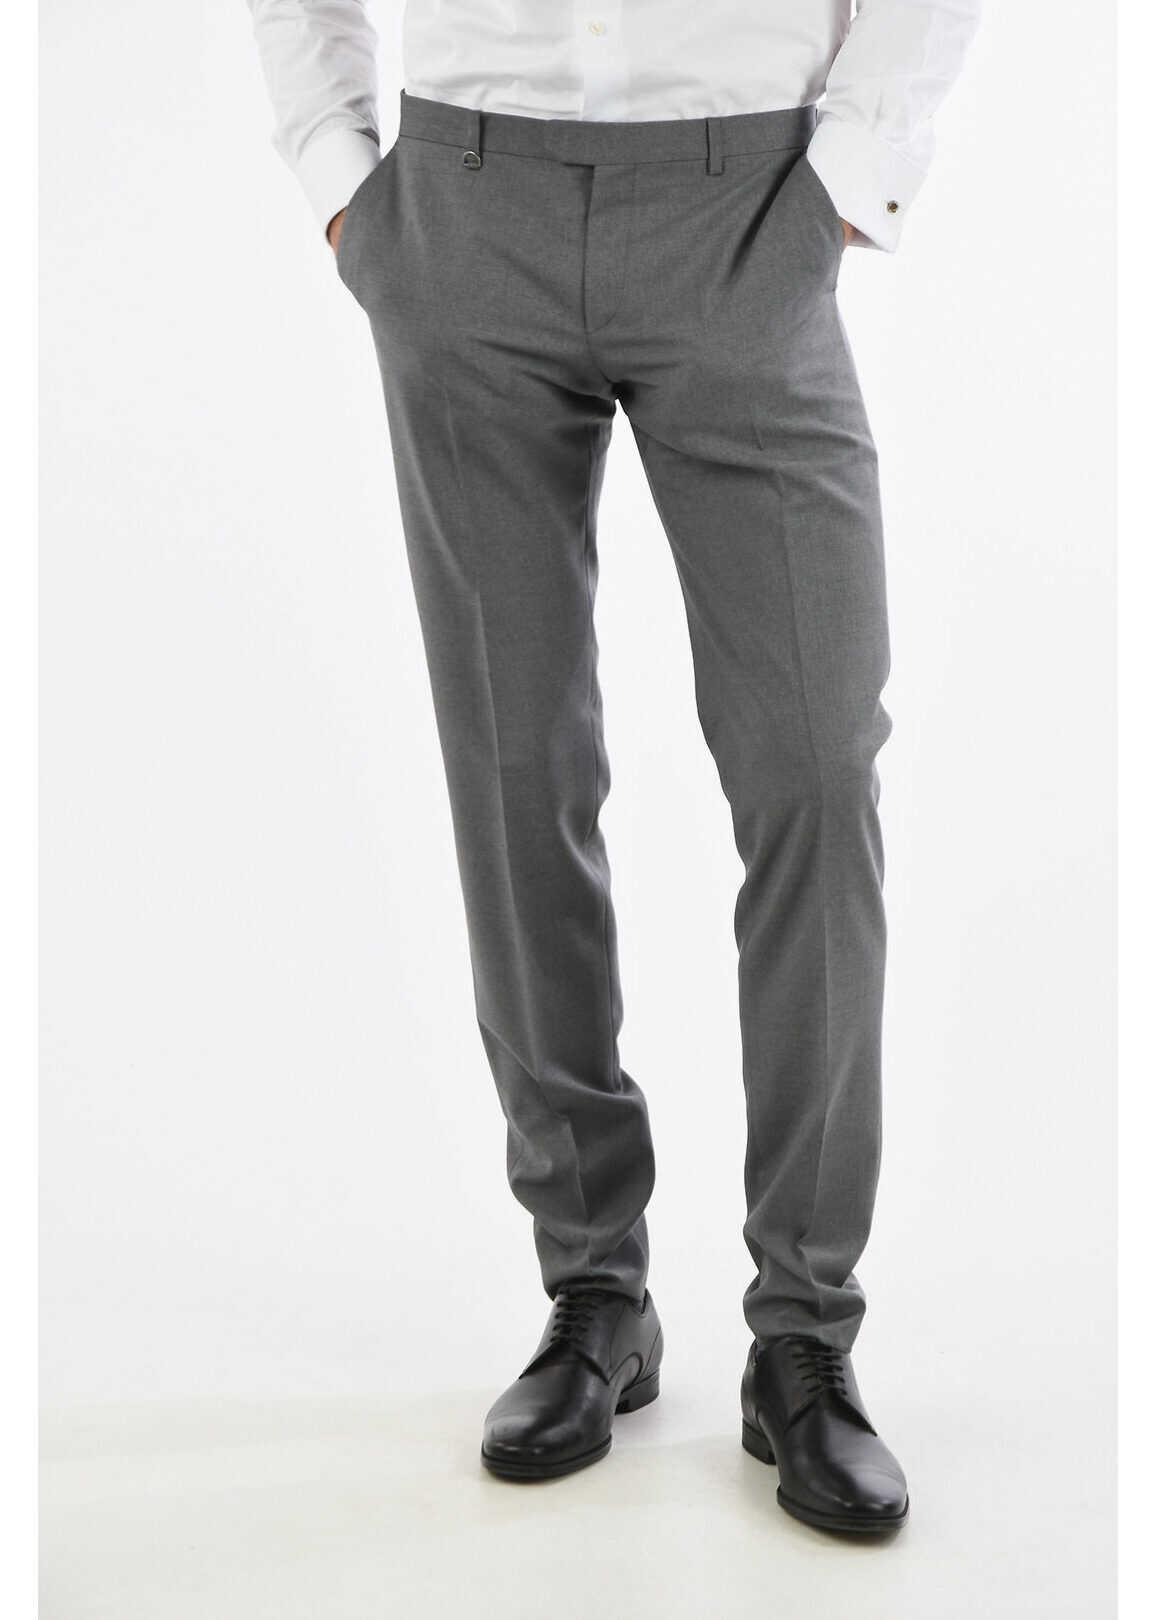 Ermenegildo Zegna ZZEGNA Wool Pants with Belt Loops and Hook Closure GRAY imagine